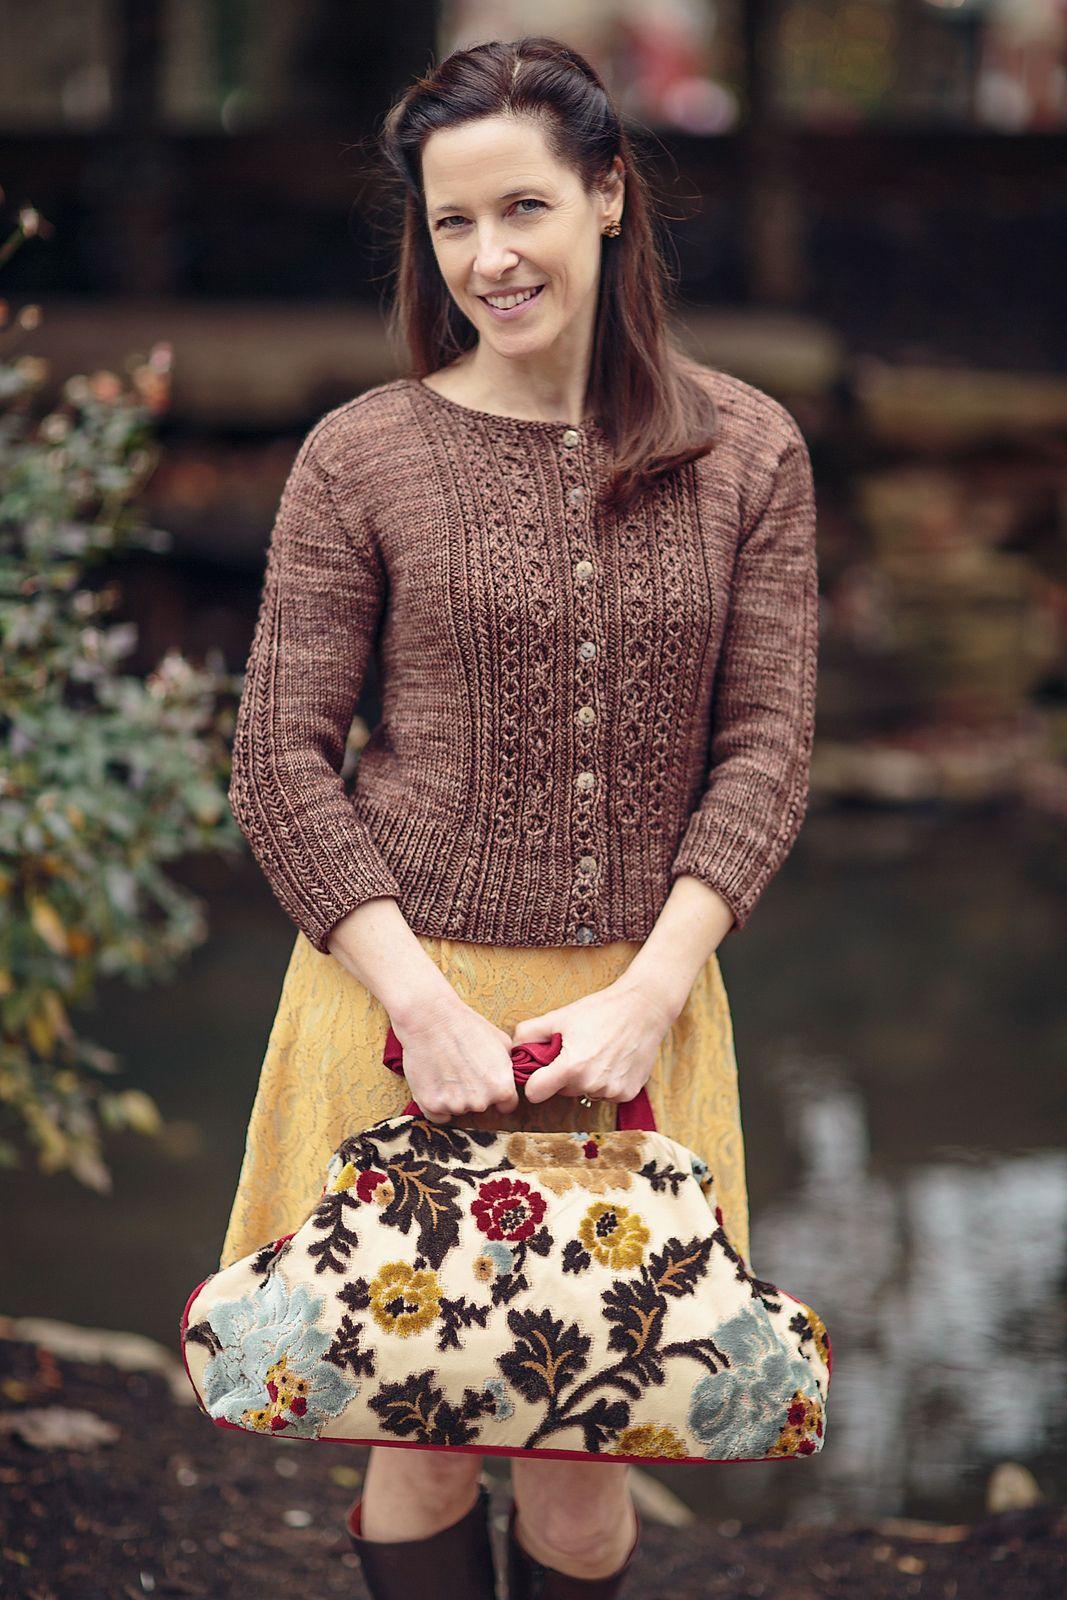 Sophie pattern by Jennifer Wood (With images) Jennifer